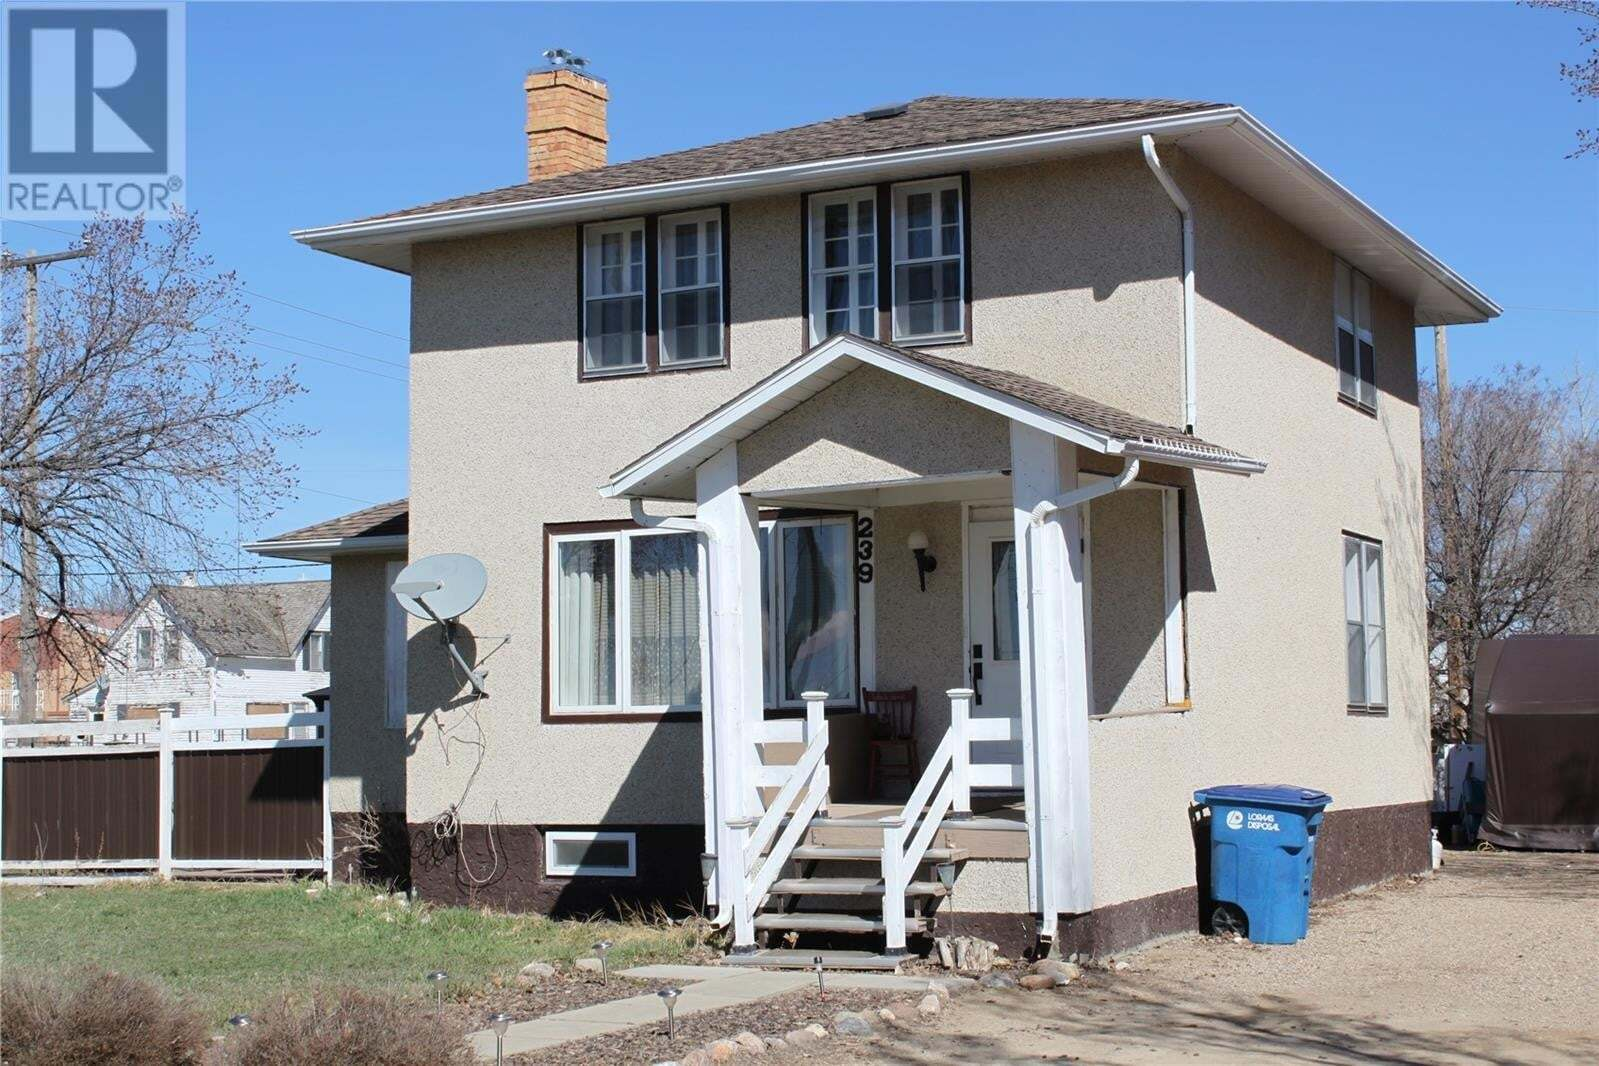 House for sale at 239 1st Ave W Gravelbourg Saskatchewan - MLS: SK819431